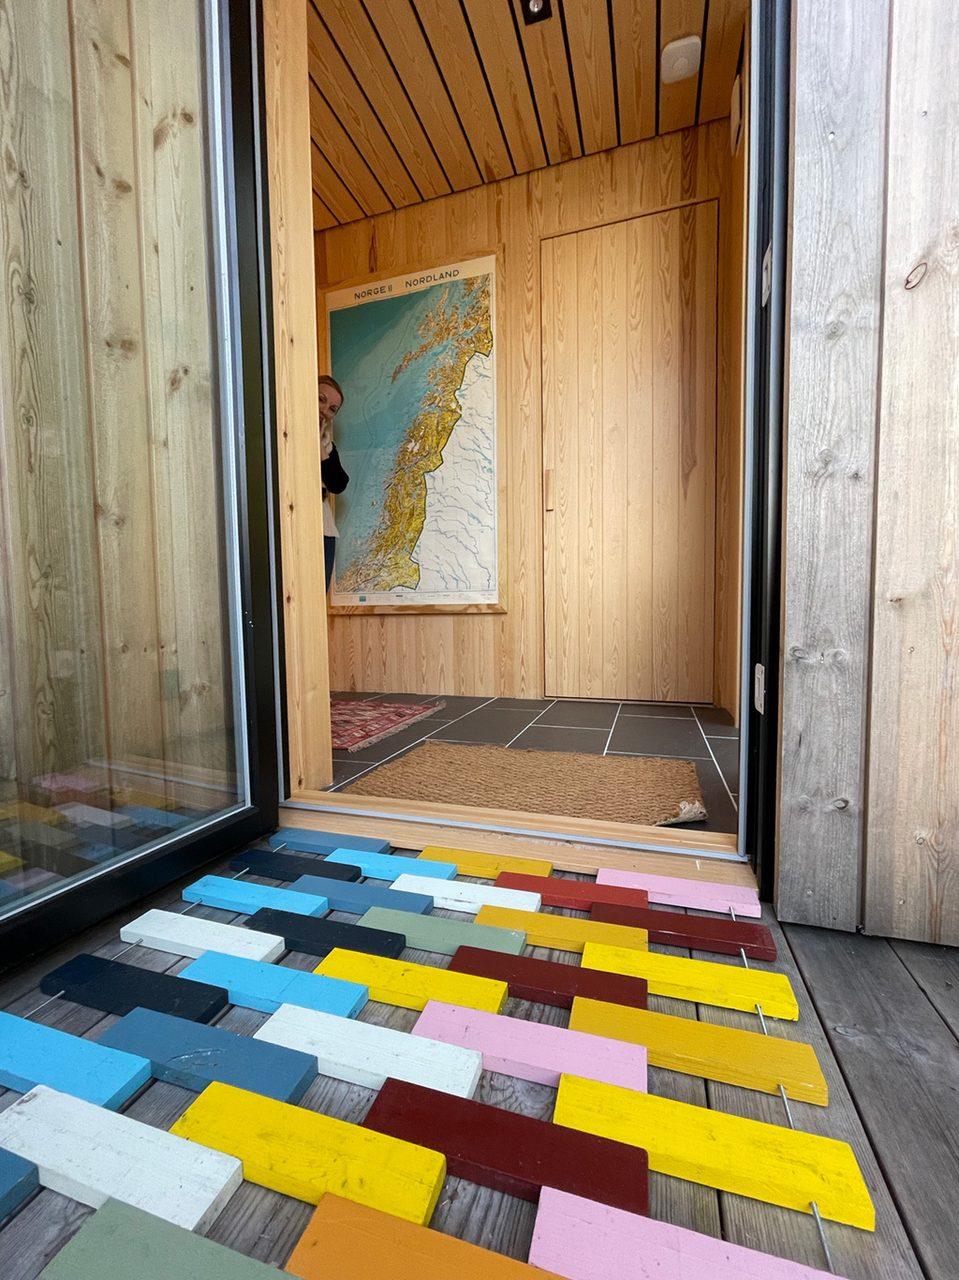 Interior design, Property, Azure, Wood, Flooring, Architecture, Floor, Art, Line, Rectangle